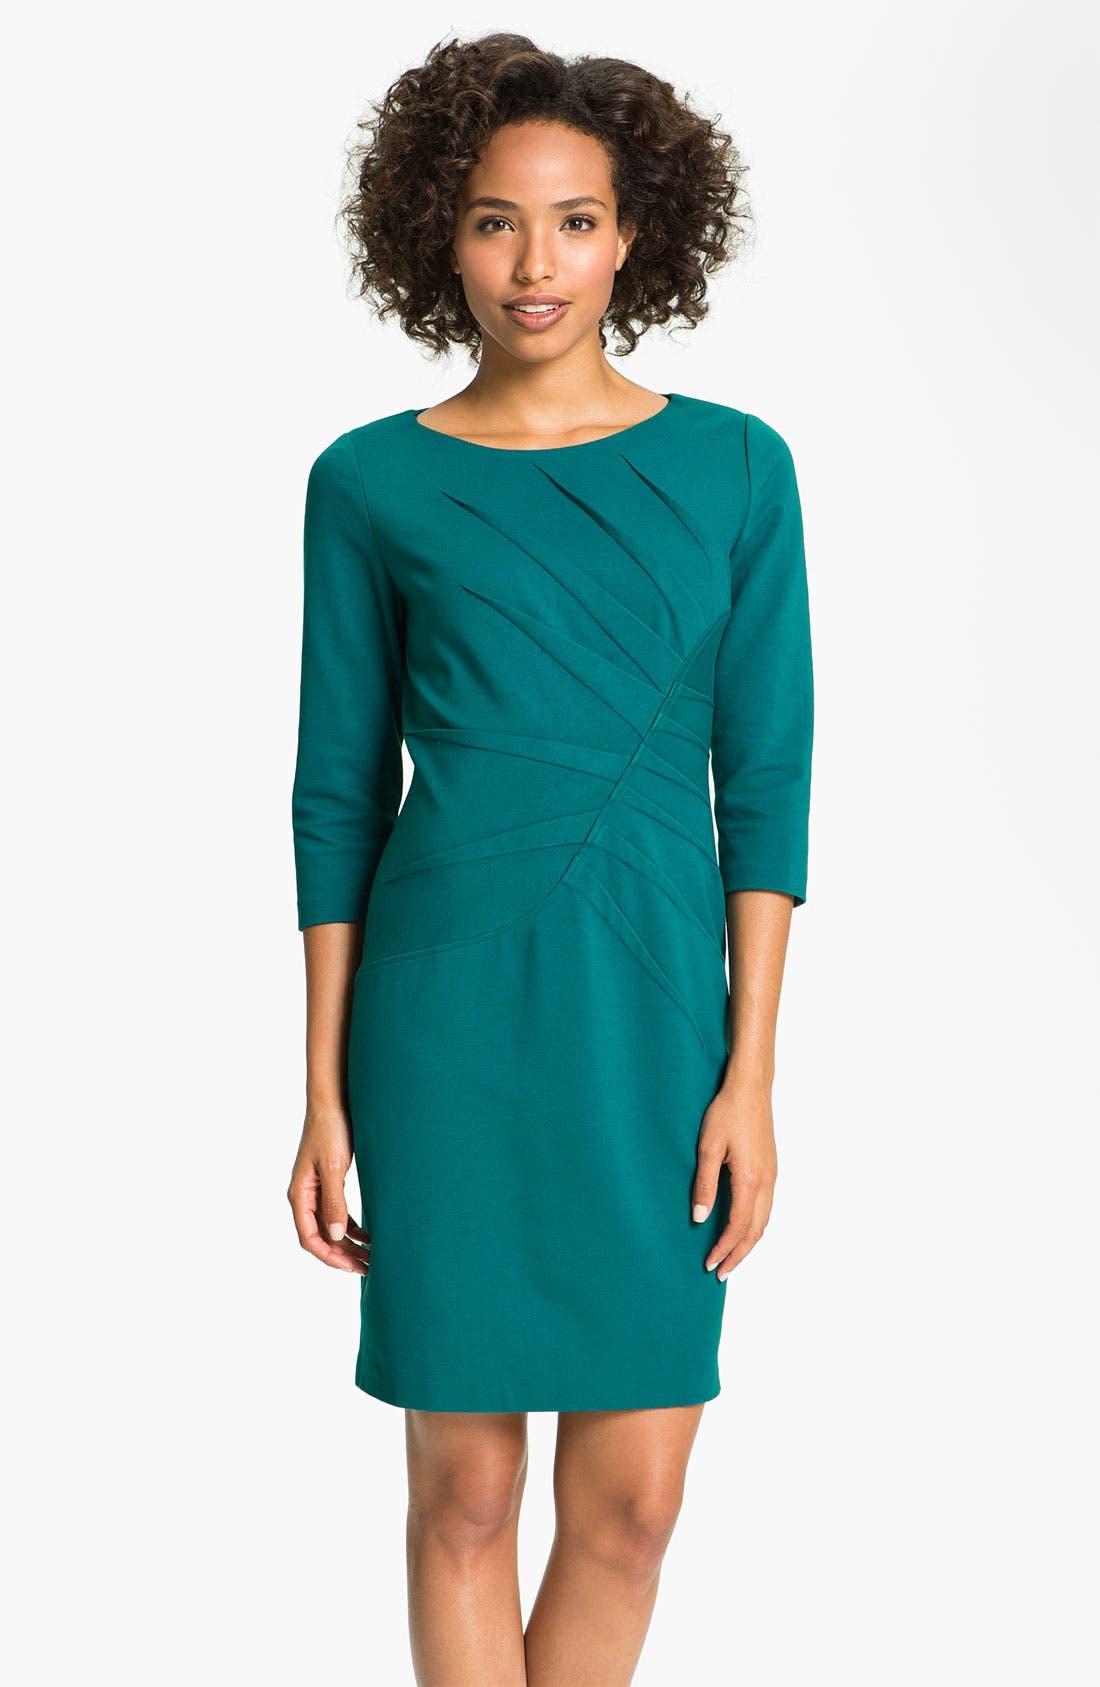 Alternate Image 1 Selected - Adrianna Papell Inverted Pleat Ponte Sheath Dress (Petite)